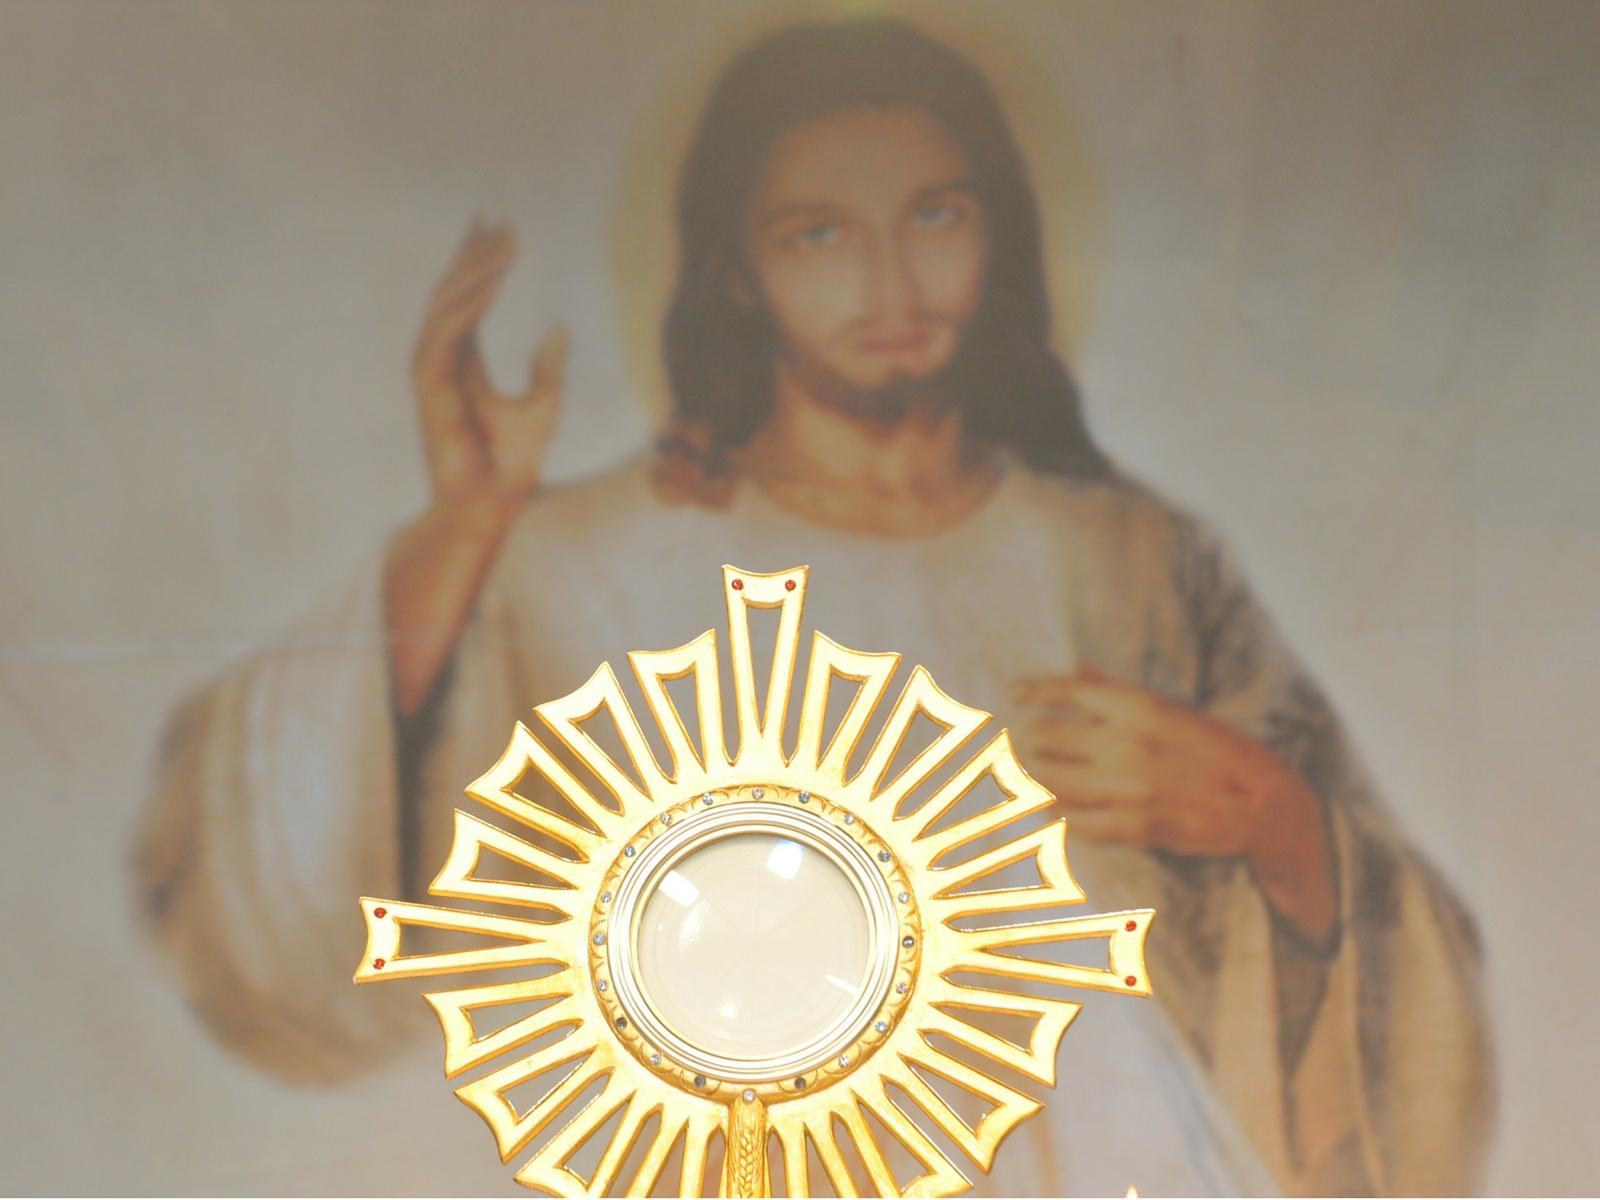 1600 x 1200 - O sentido da Festa da Divina Misericórdia